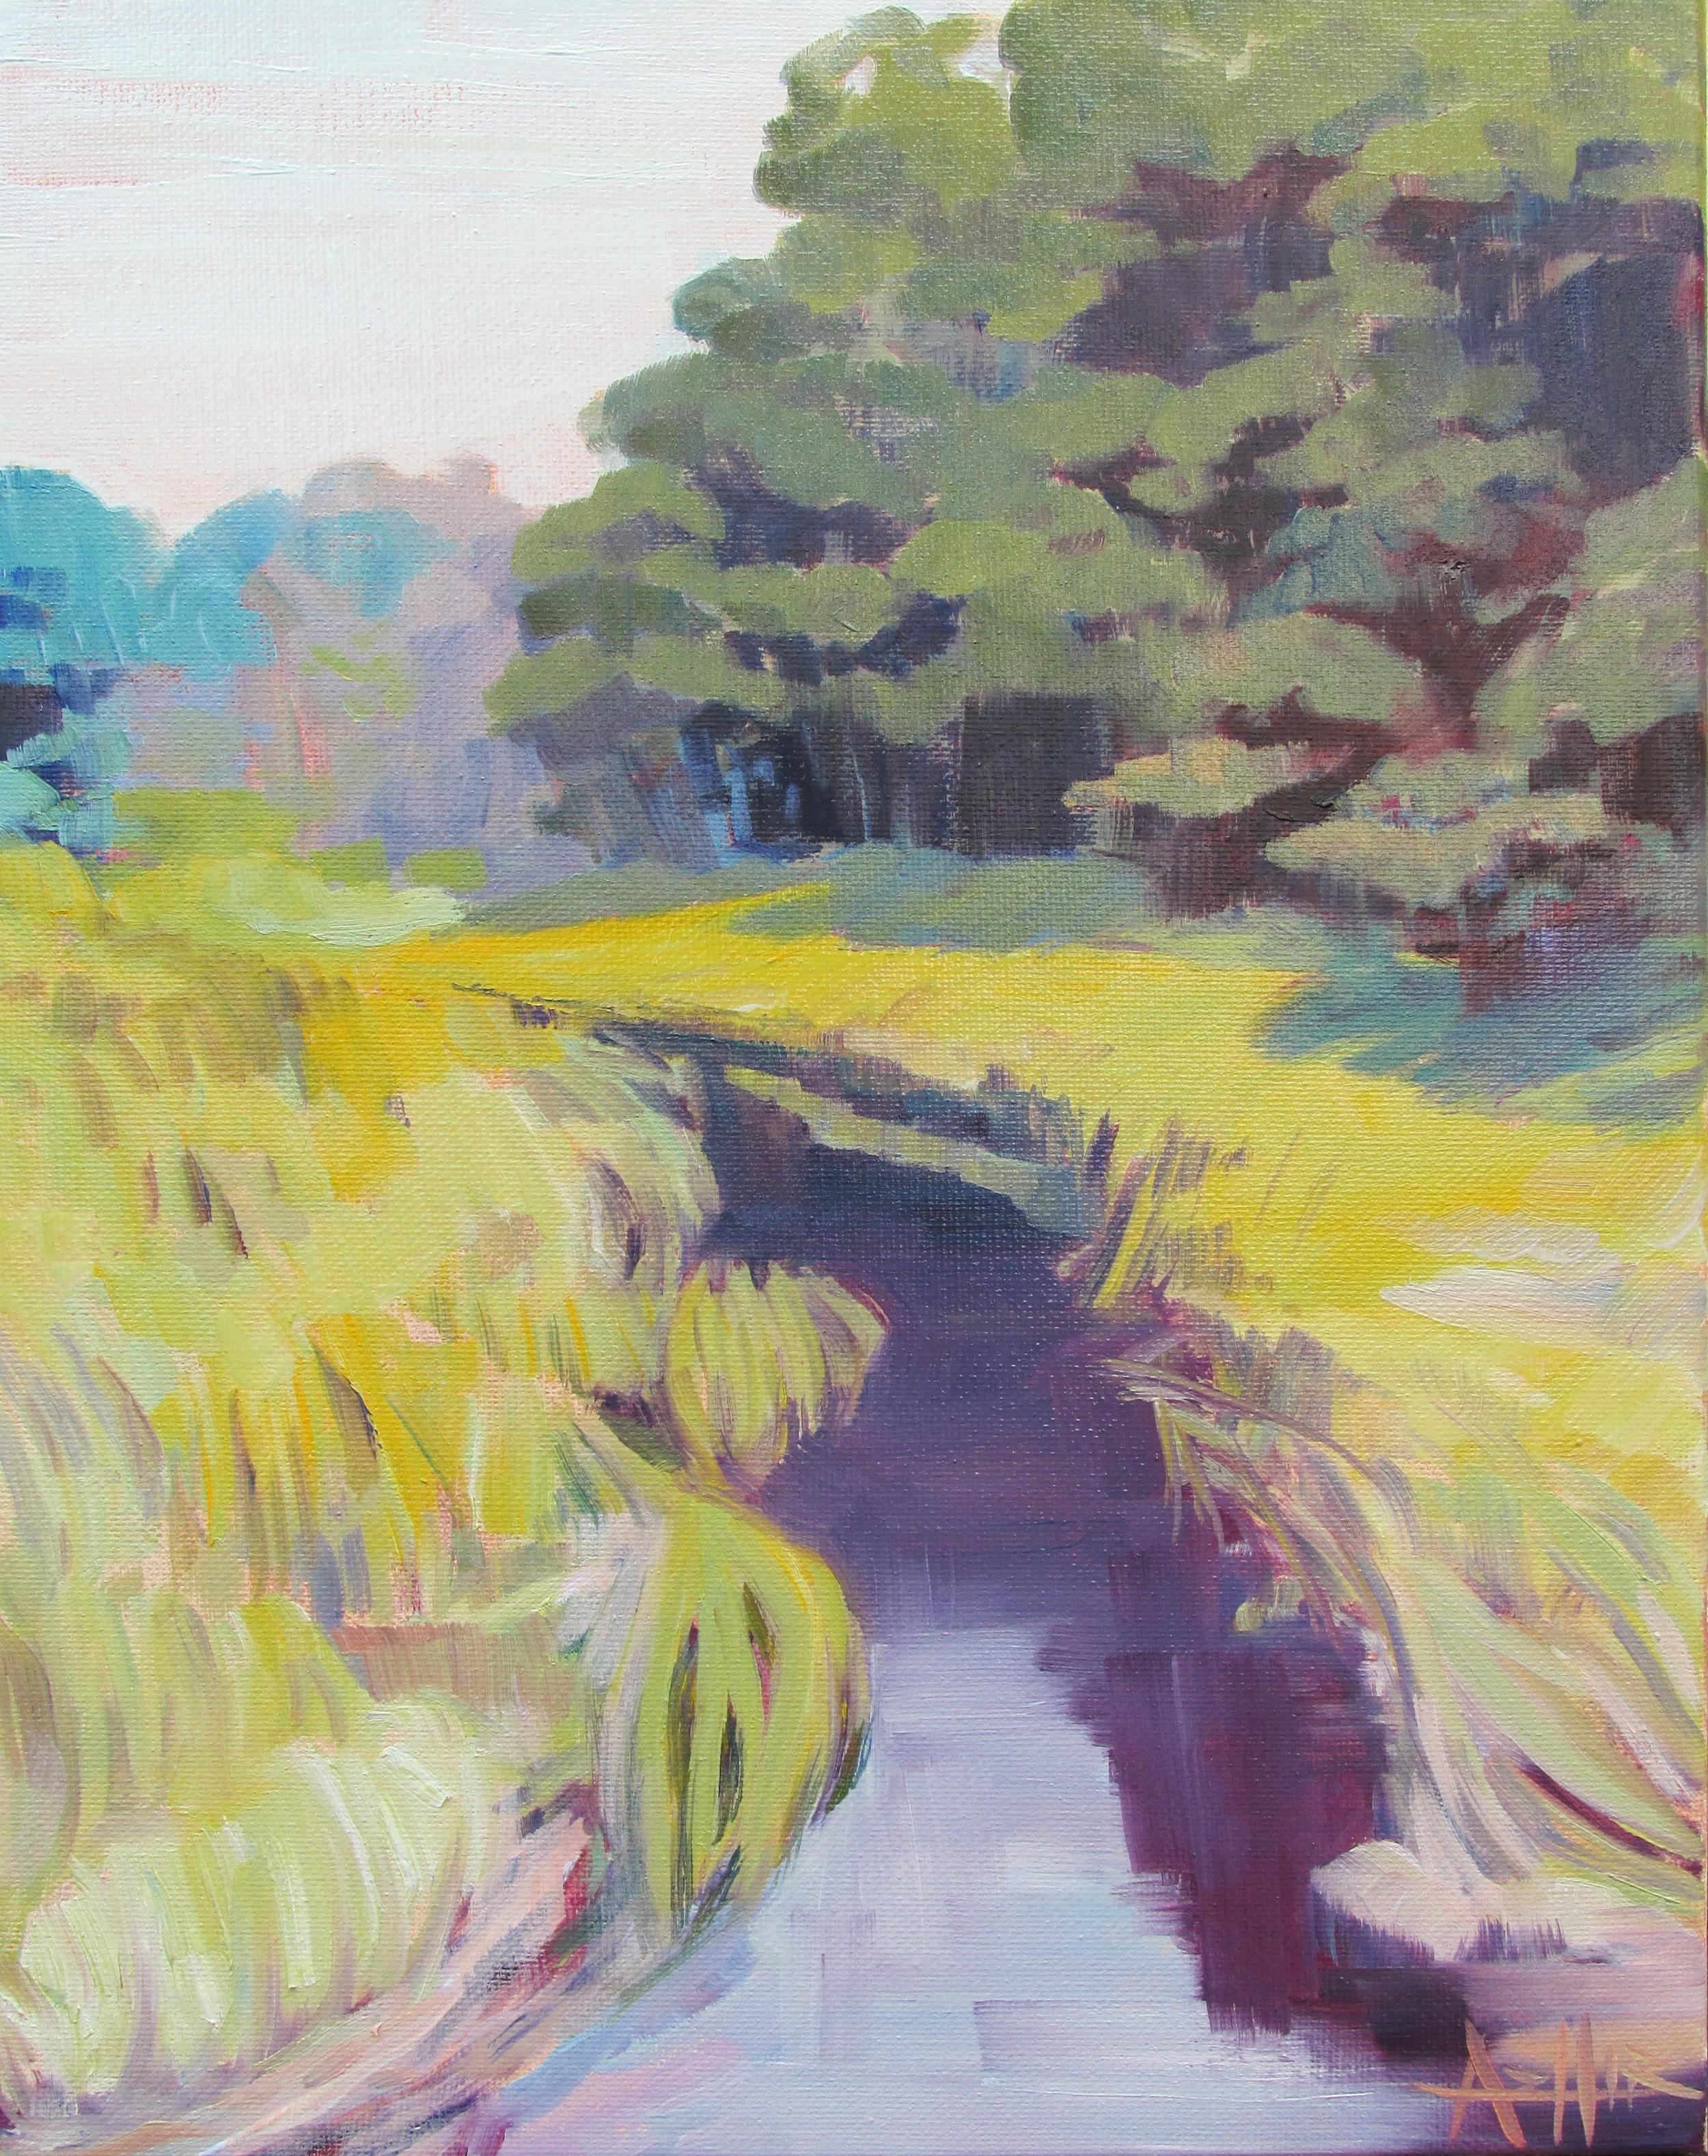 "SOLD, Dunes Creek, Copyright 2015 Hirschten, Oil on Canvas 11"" x 14"""